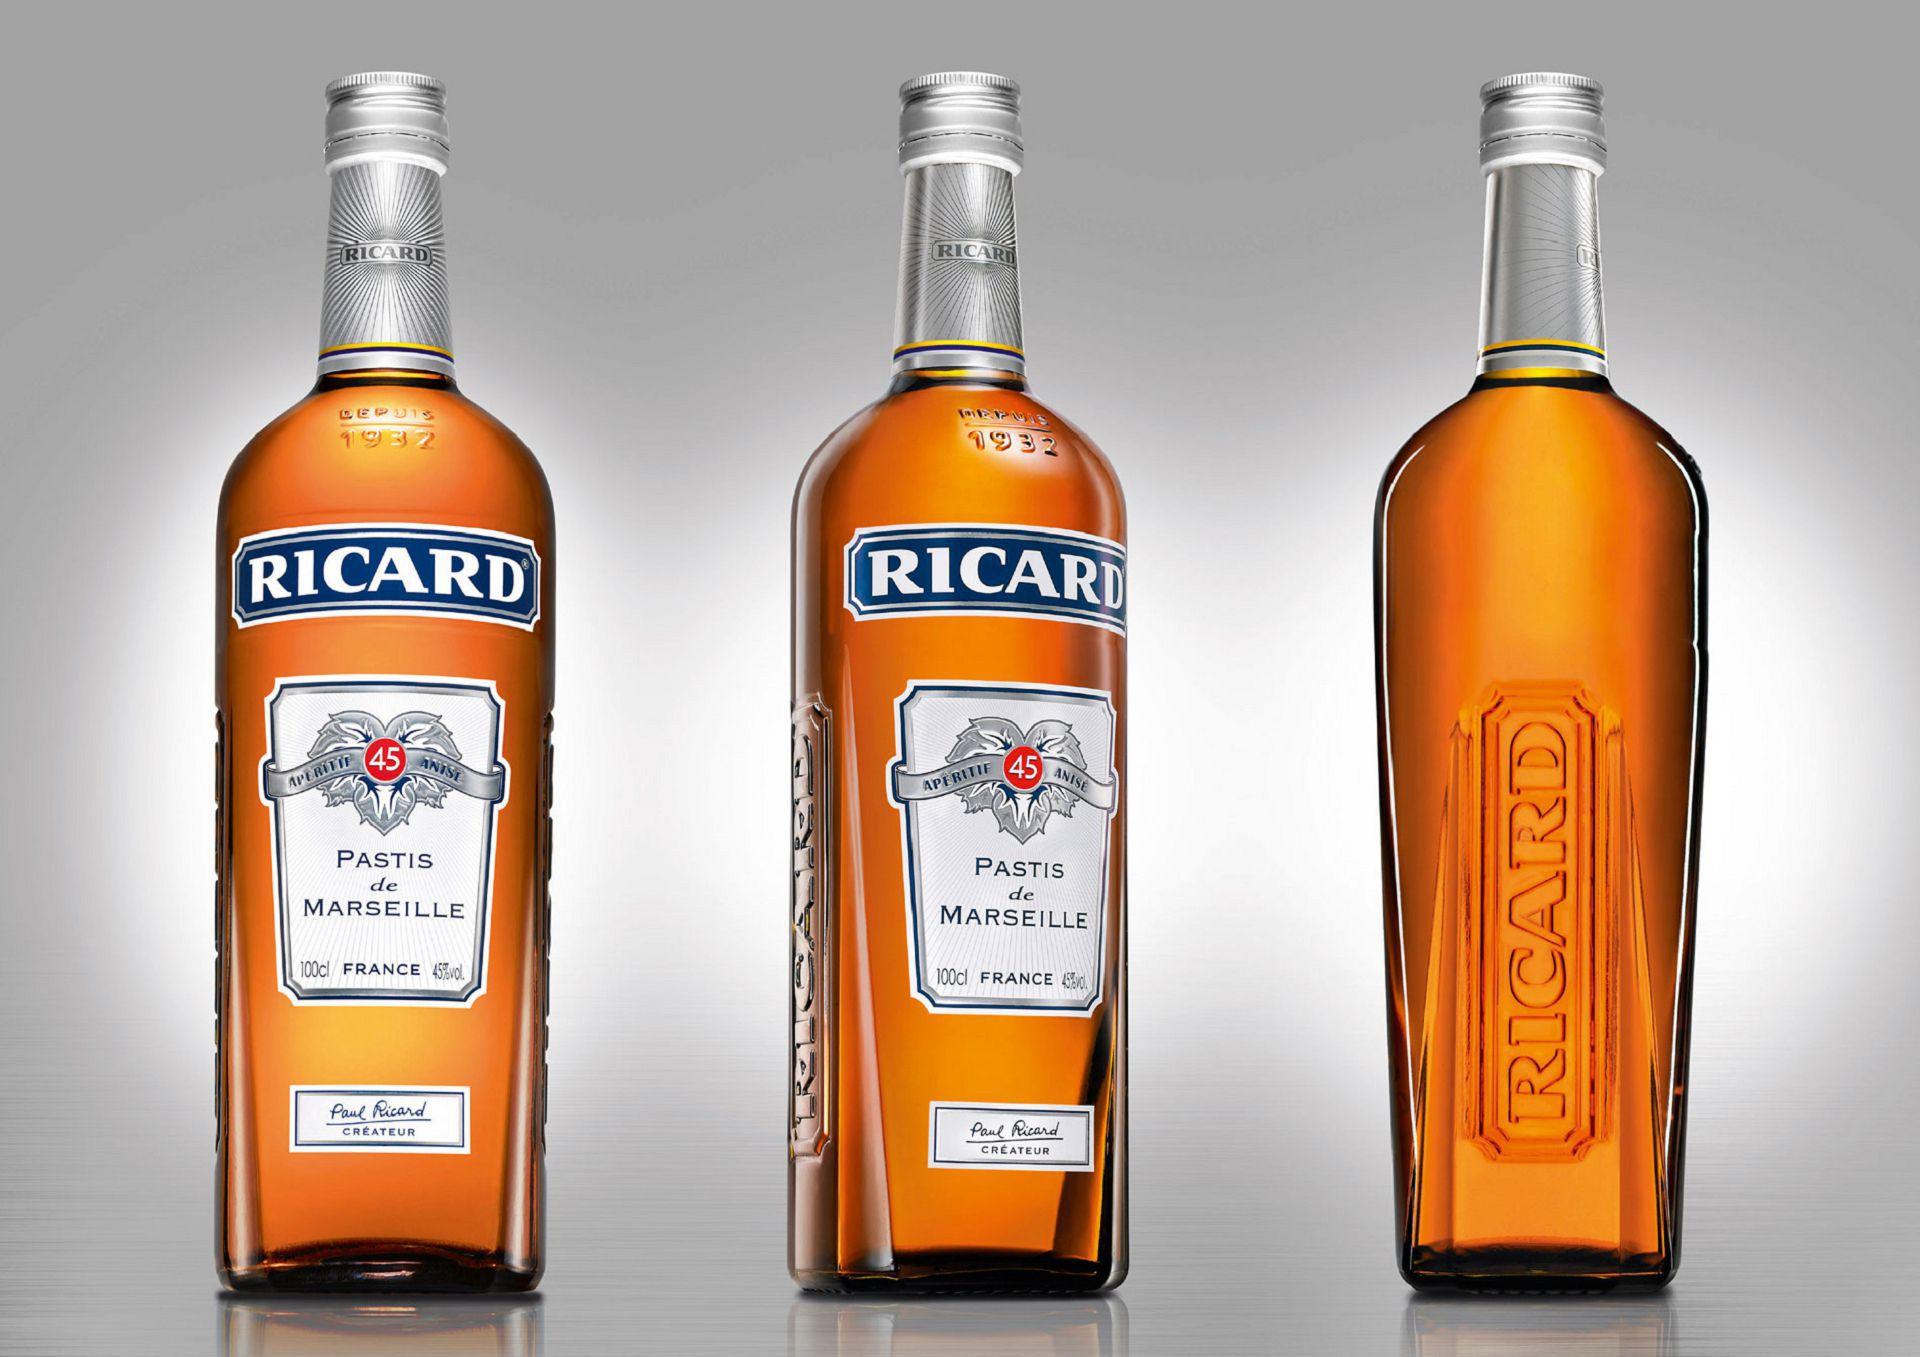 Ricard Wallpapers Hd